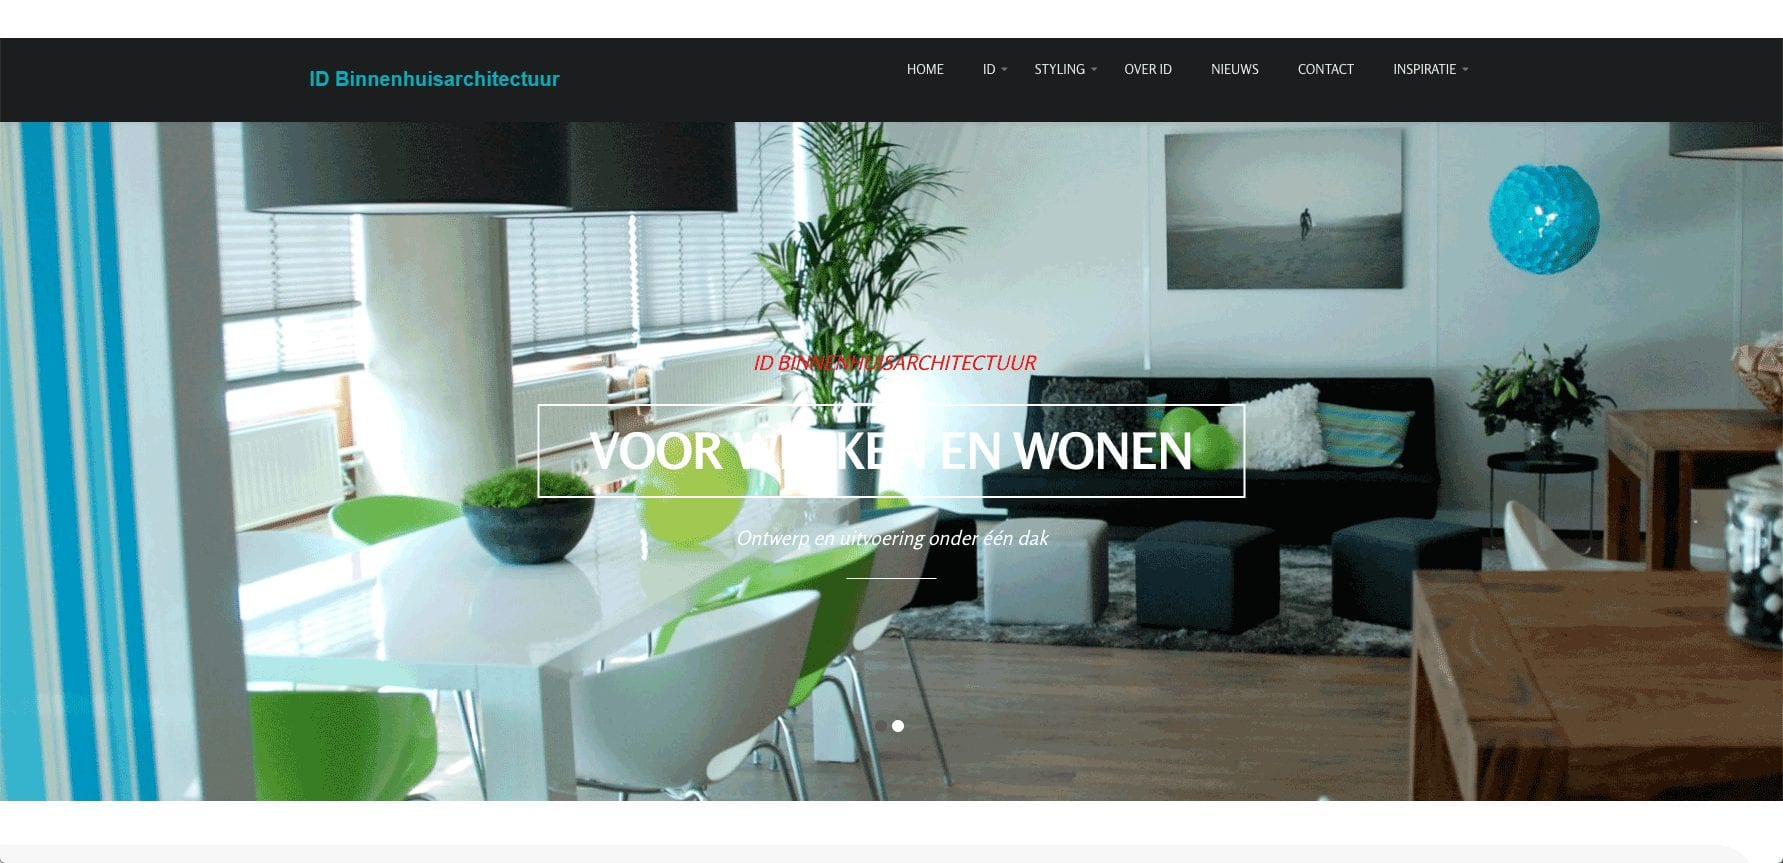 Portfolio-Wordpress-Webdesginer-Jcmwebdesign-ID-Binnenhuisarchitectuur